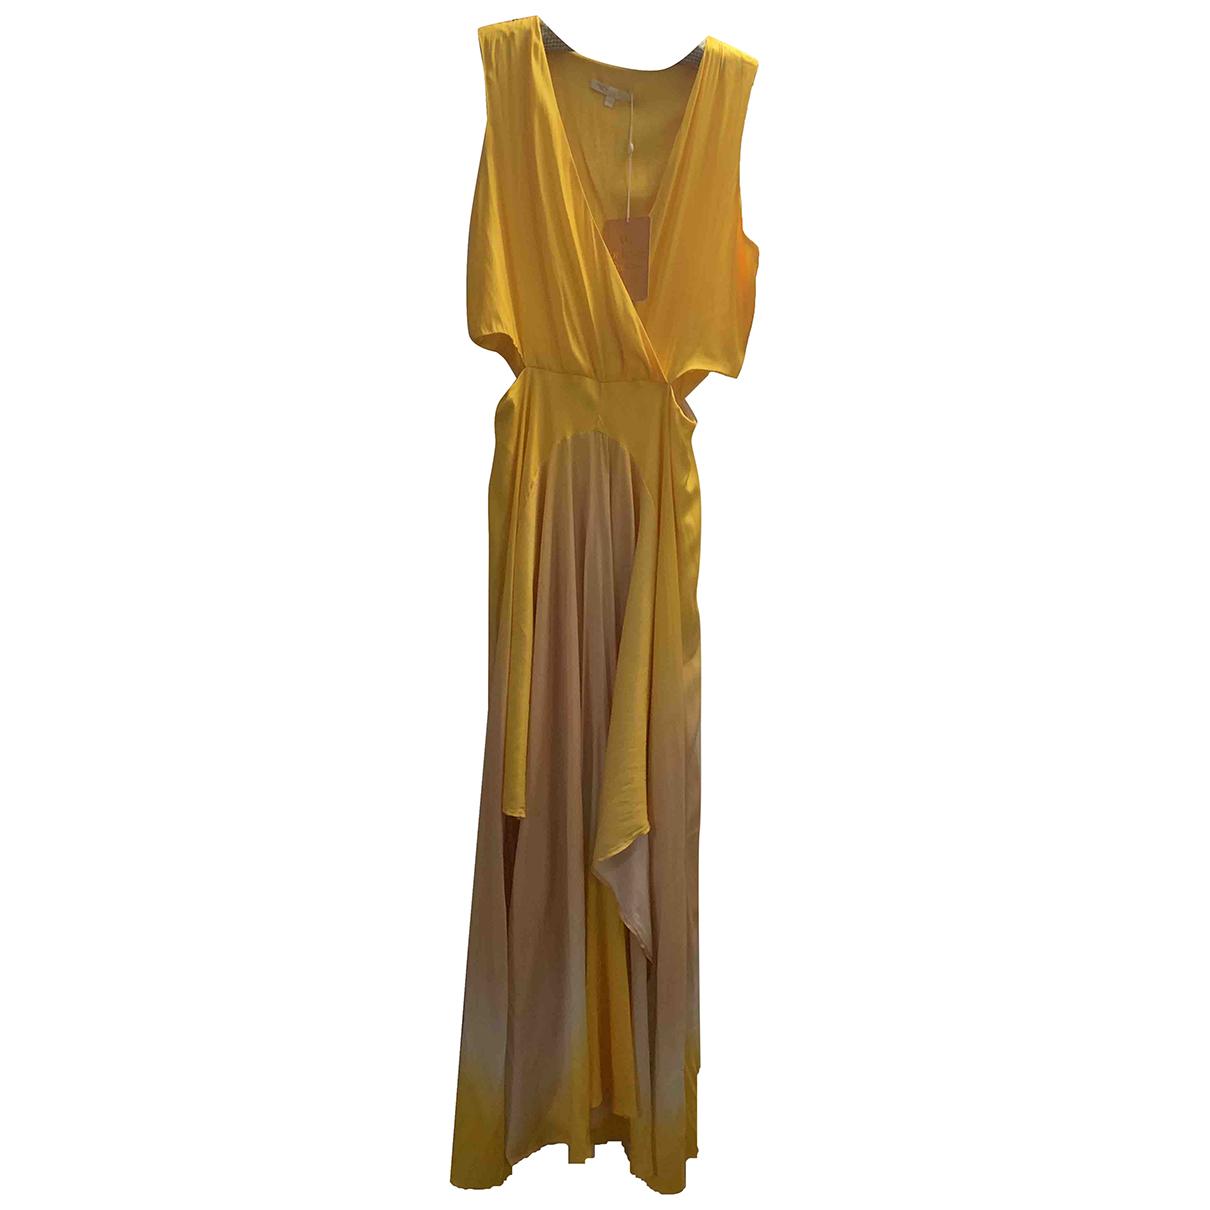 Maje Spring Summer 2019 Yellow dress for Women 2 0-5